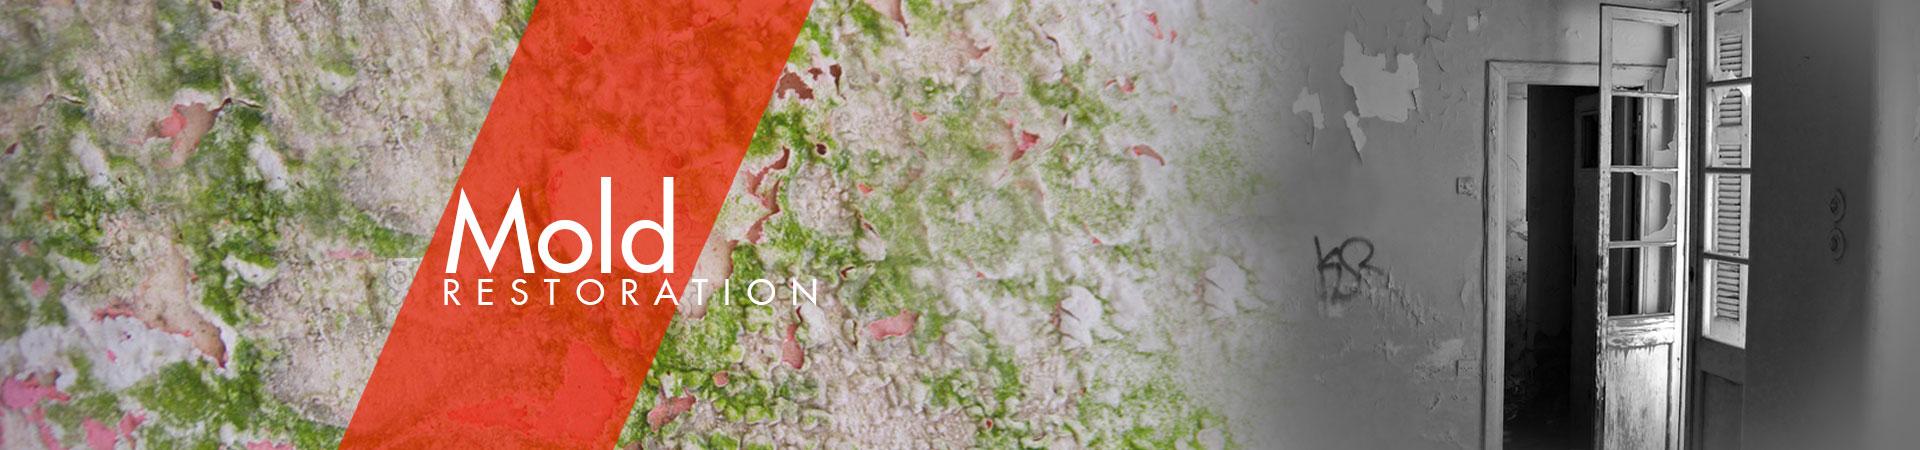 disaster restoration - mold remediation